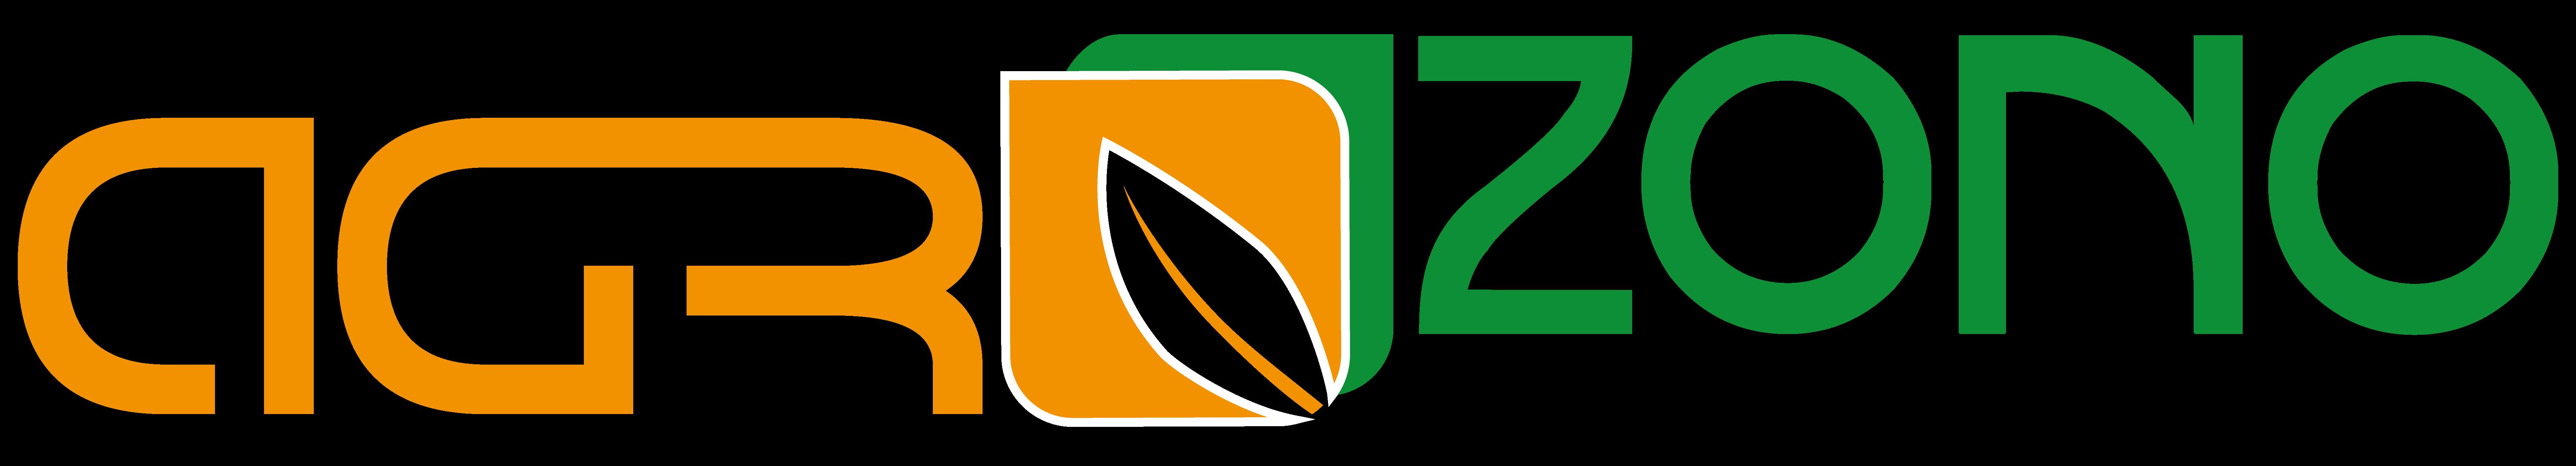 Agrozono